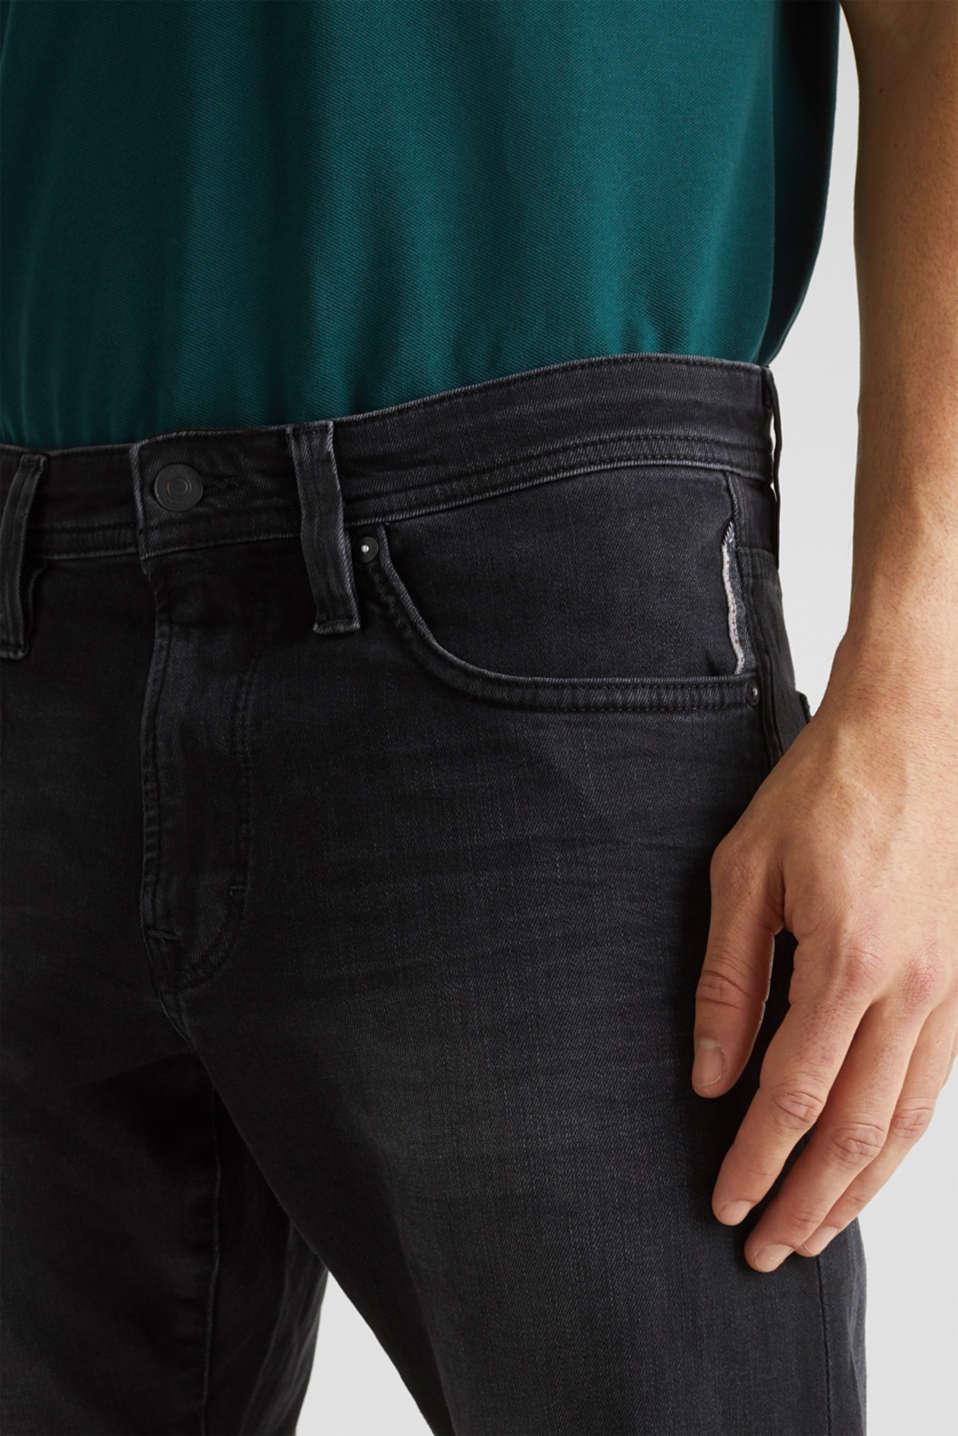 Pants denim Slim fit, BLACK DARK WASH, detail image number 3